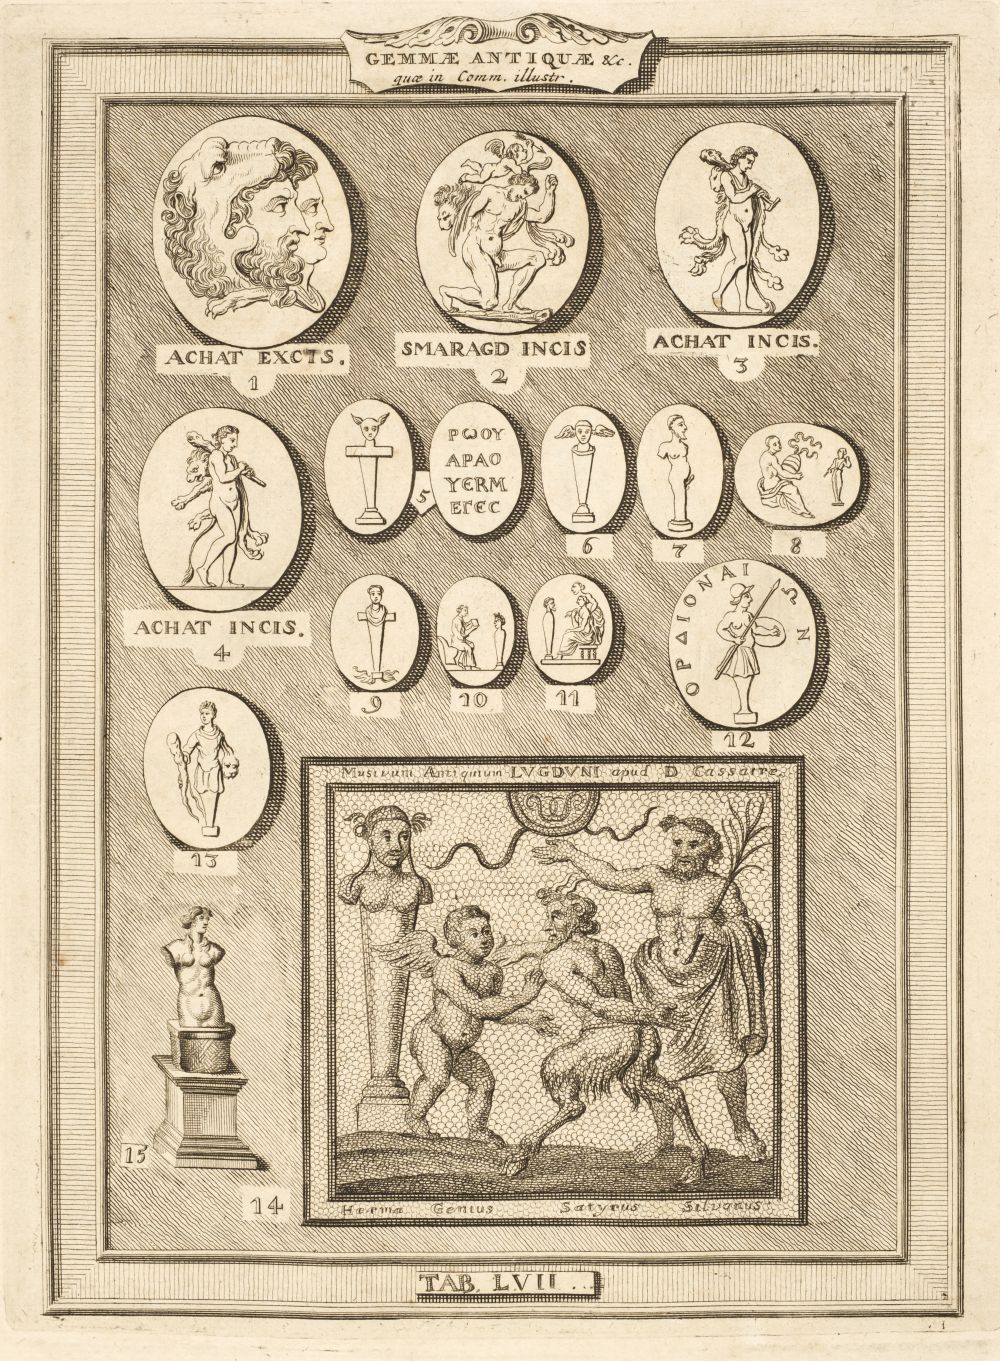 Paruta (Filippo). Sicilia Numismatica, 3 parts in 2 volumes, 1723